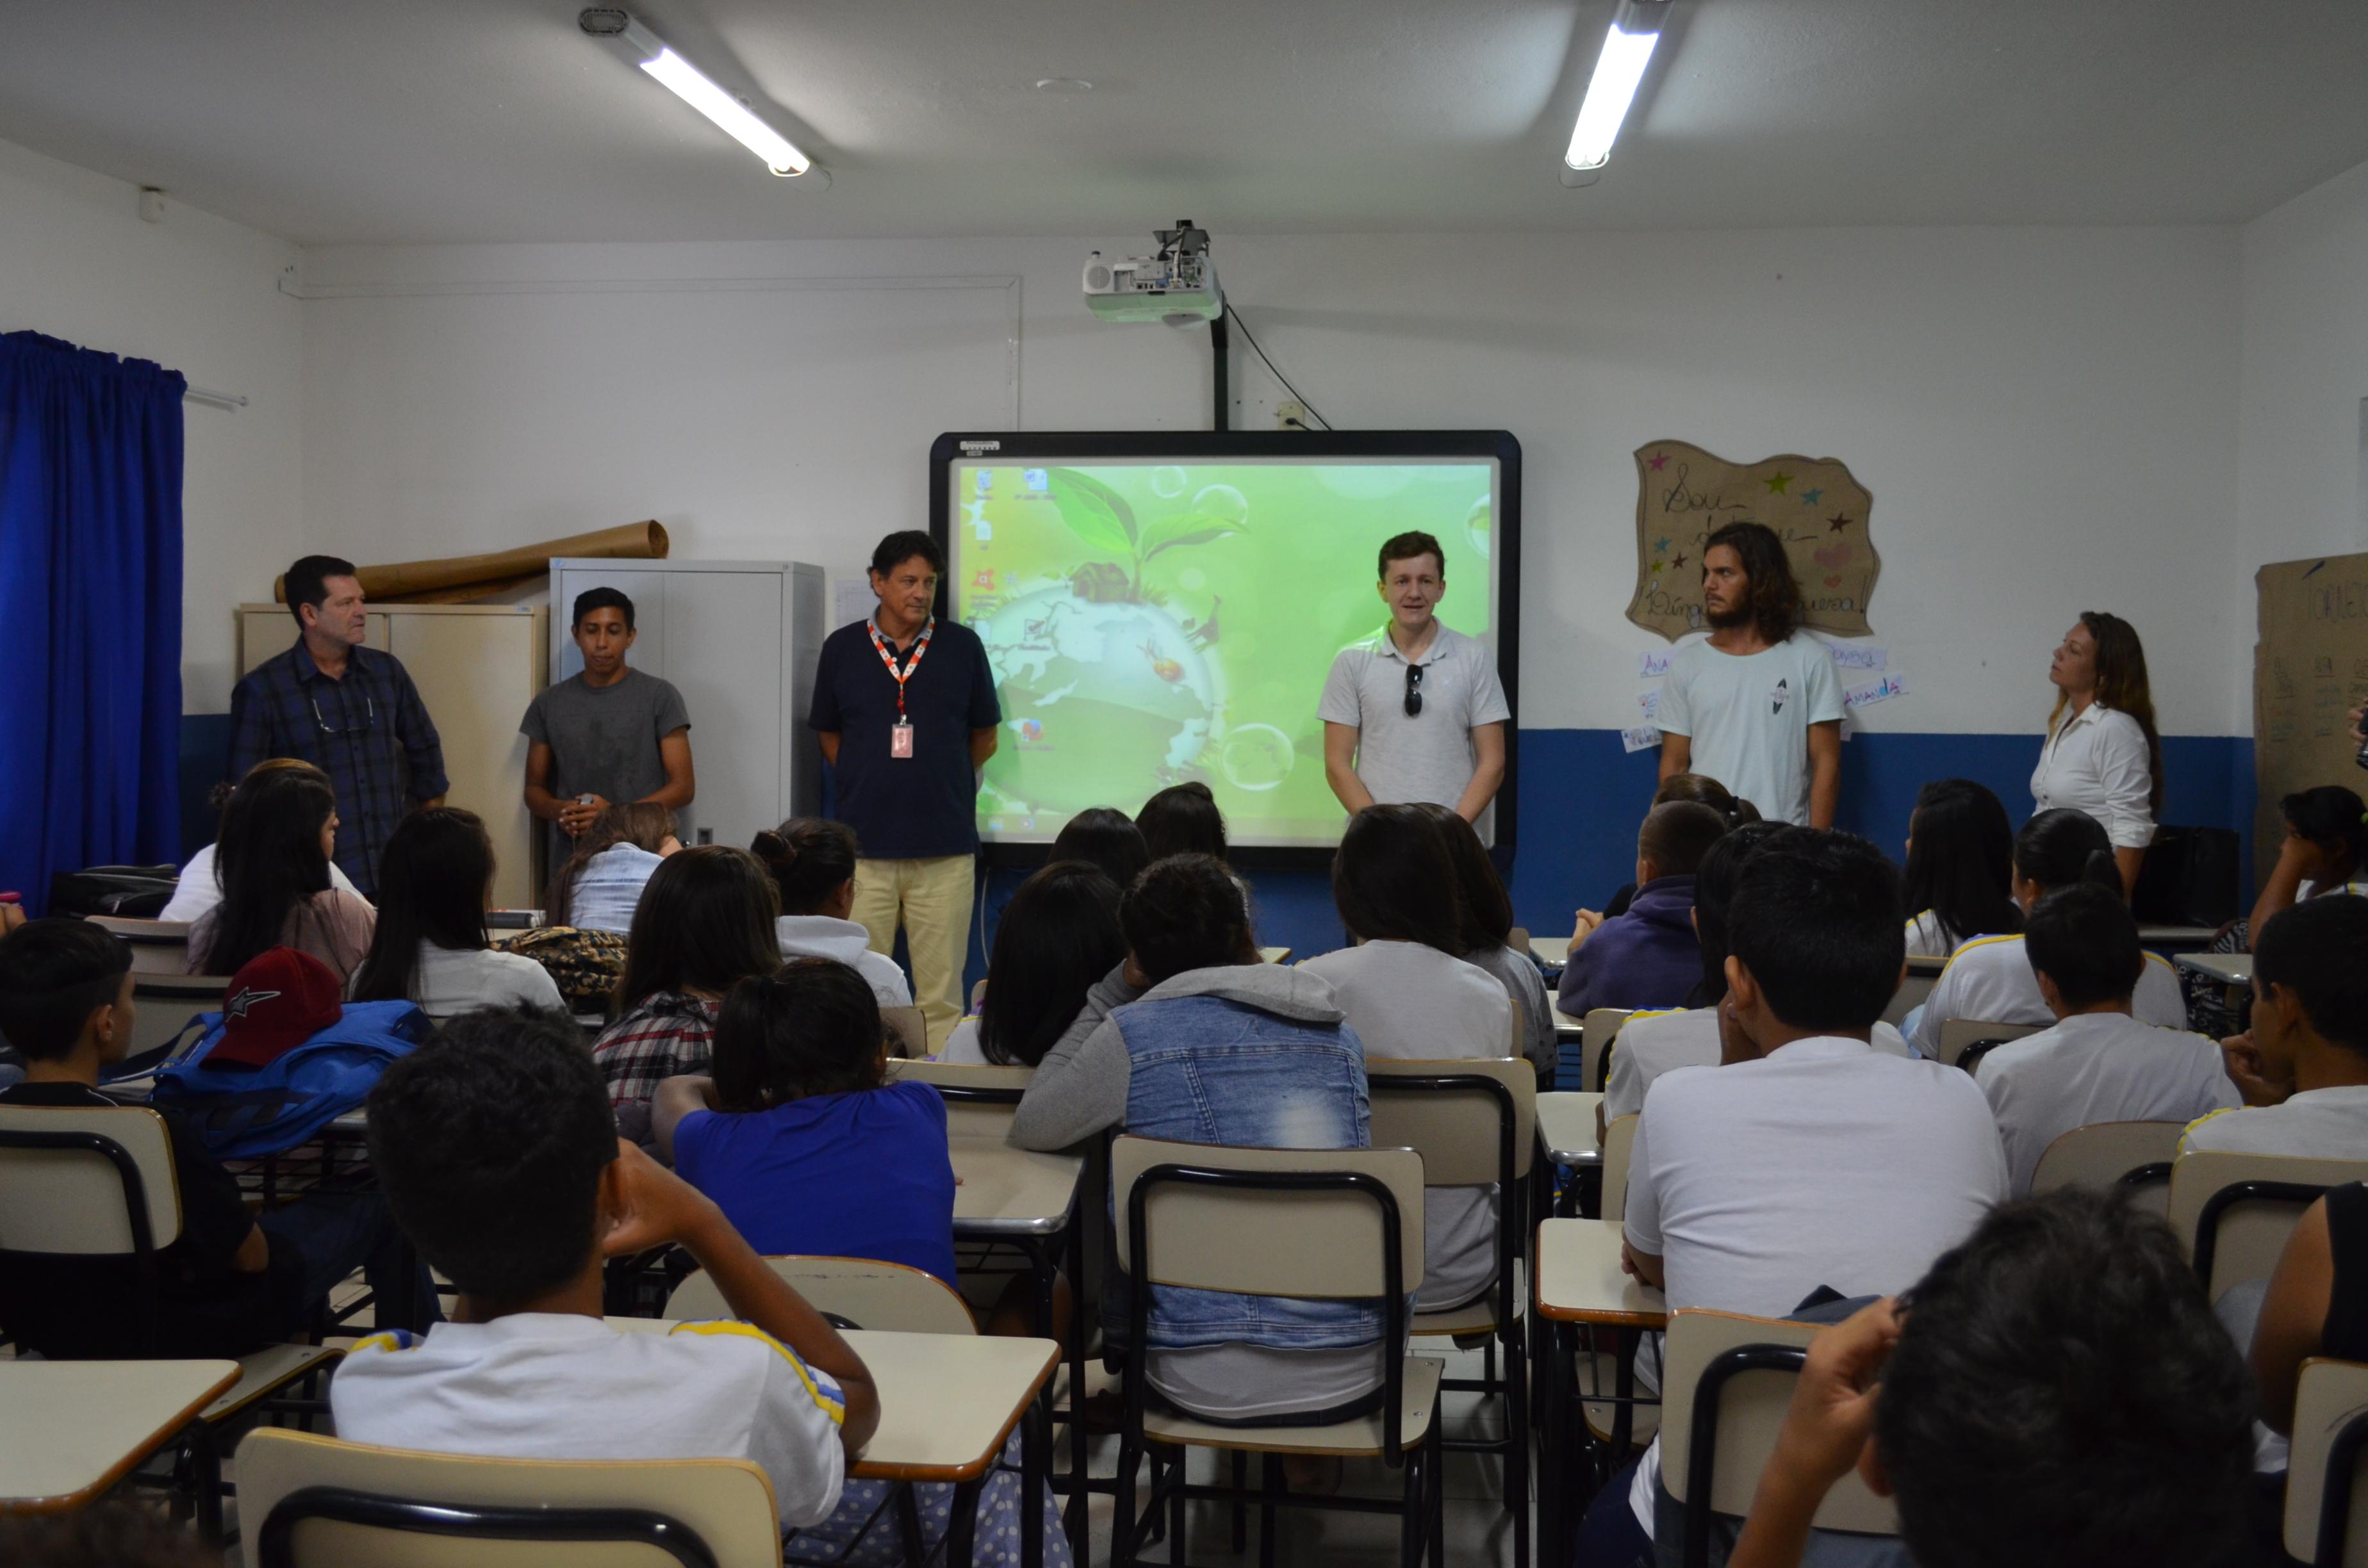 Portonave patrocina projeto de educação ambiental   Portonave